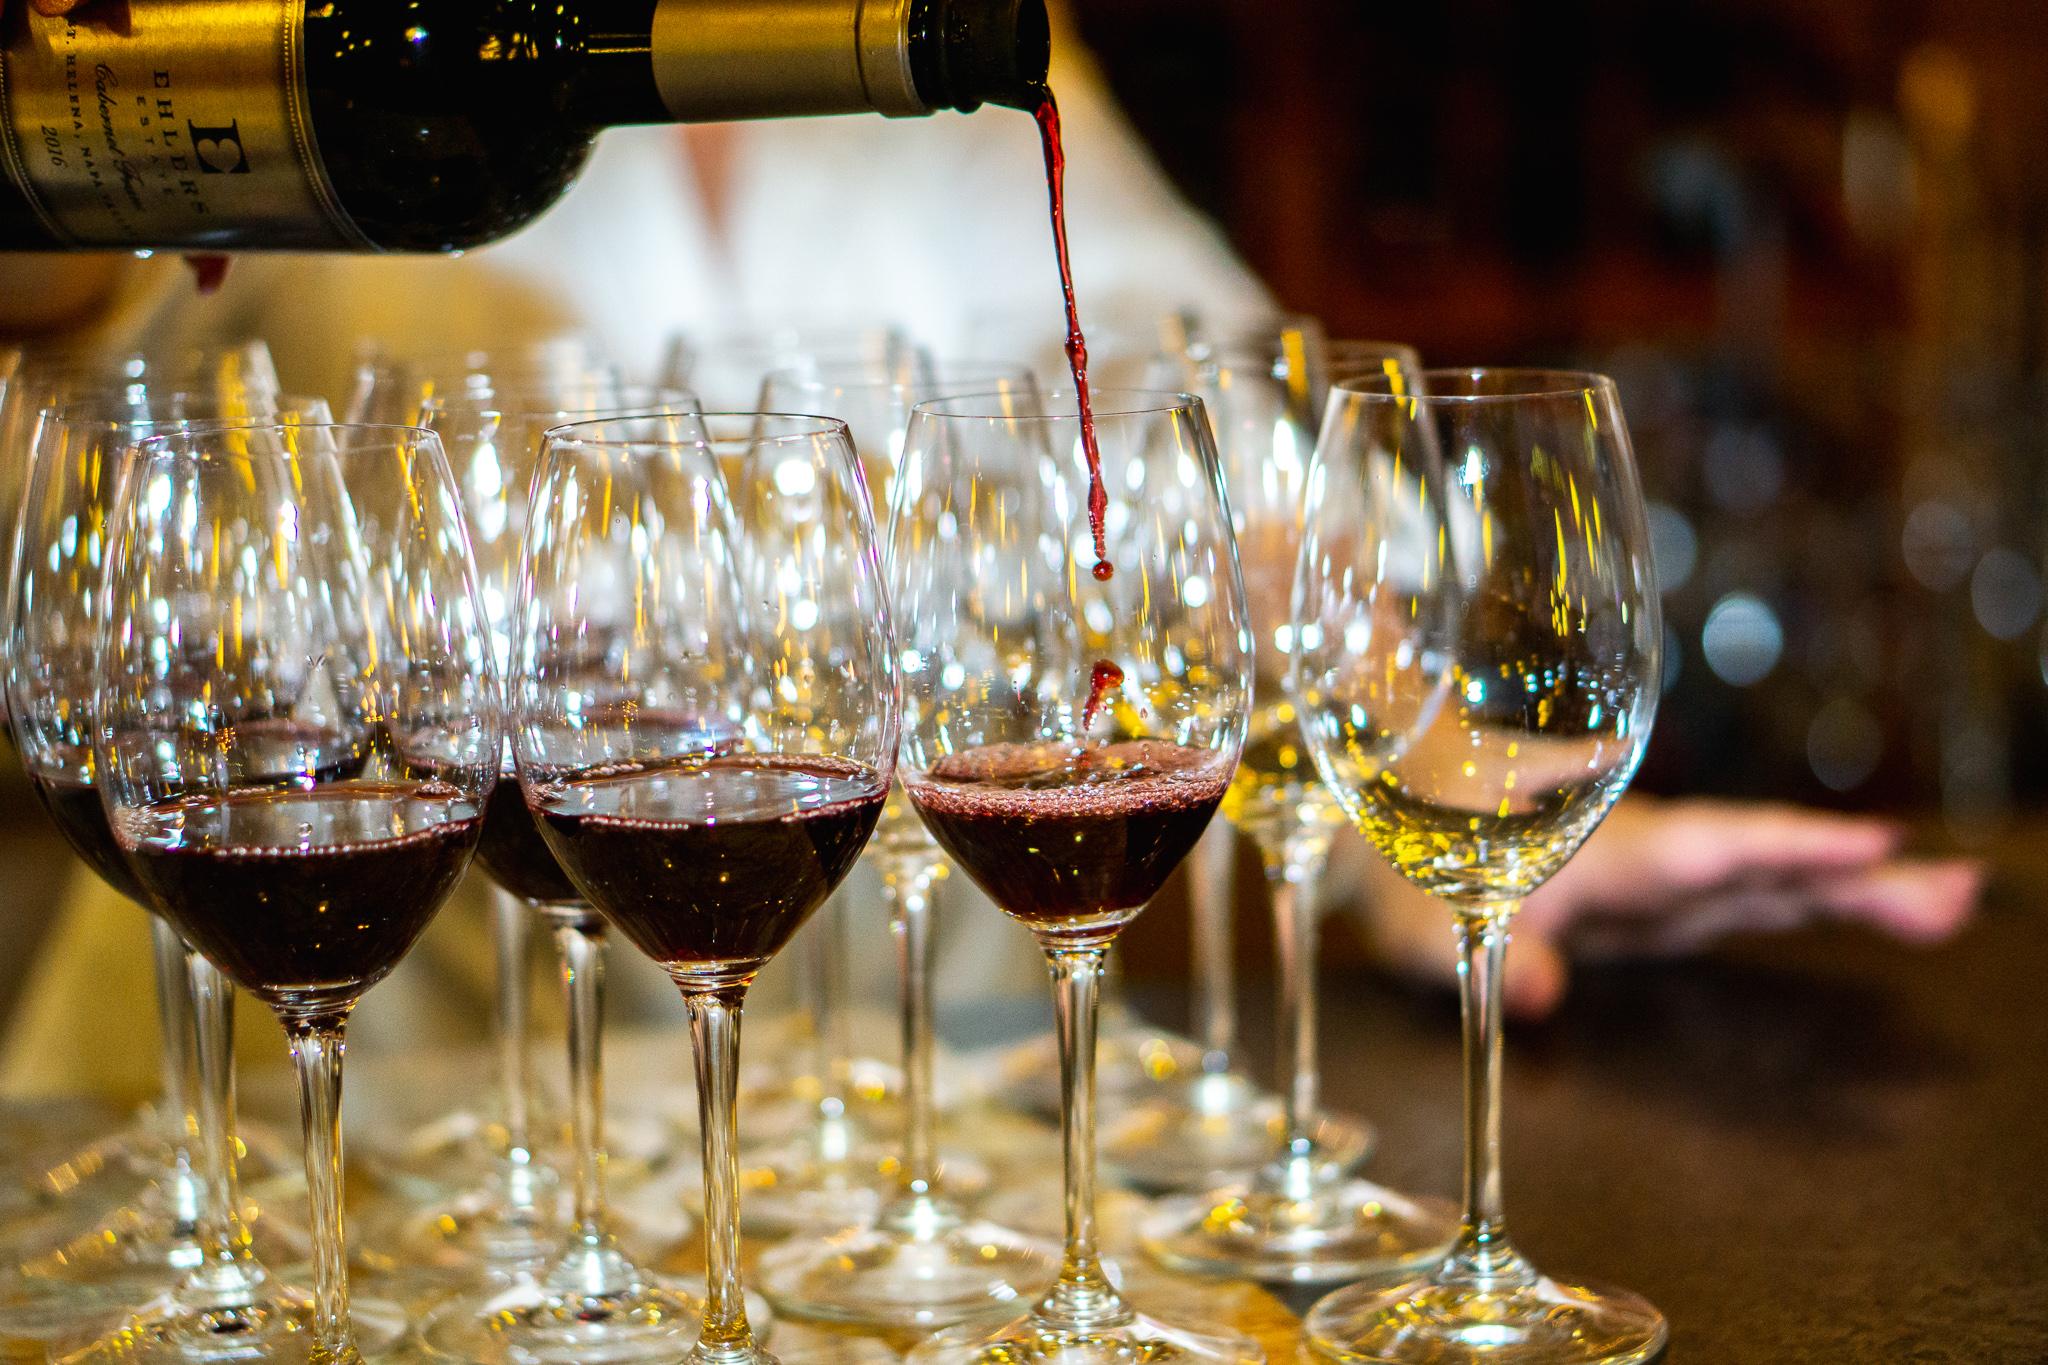 wine-maestro-the-sassy-gourmet-wine68.jpg